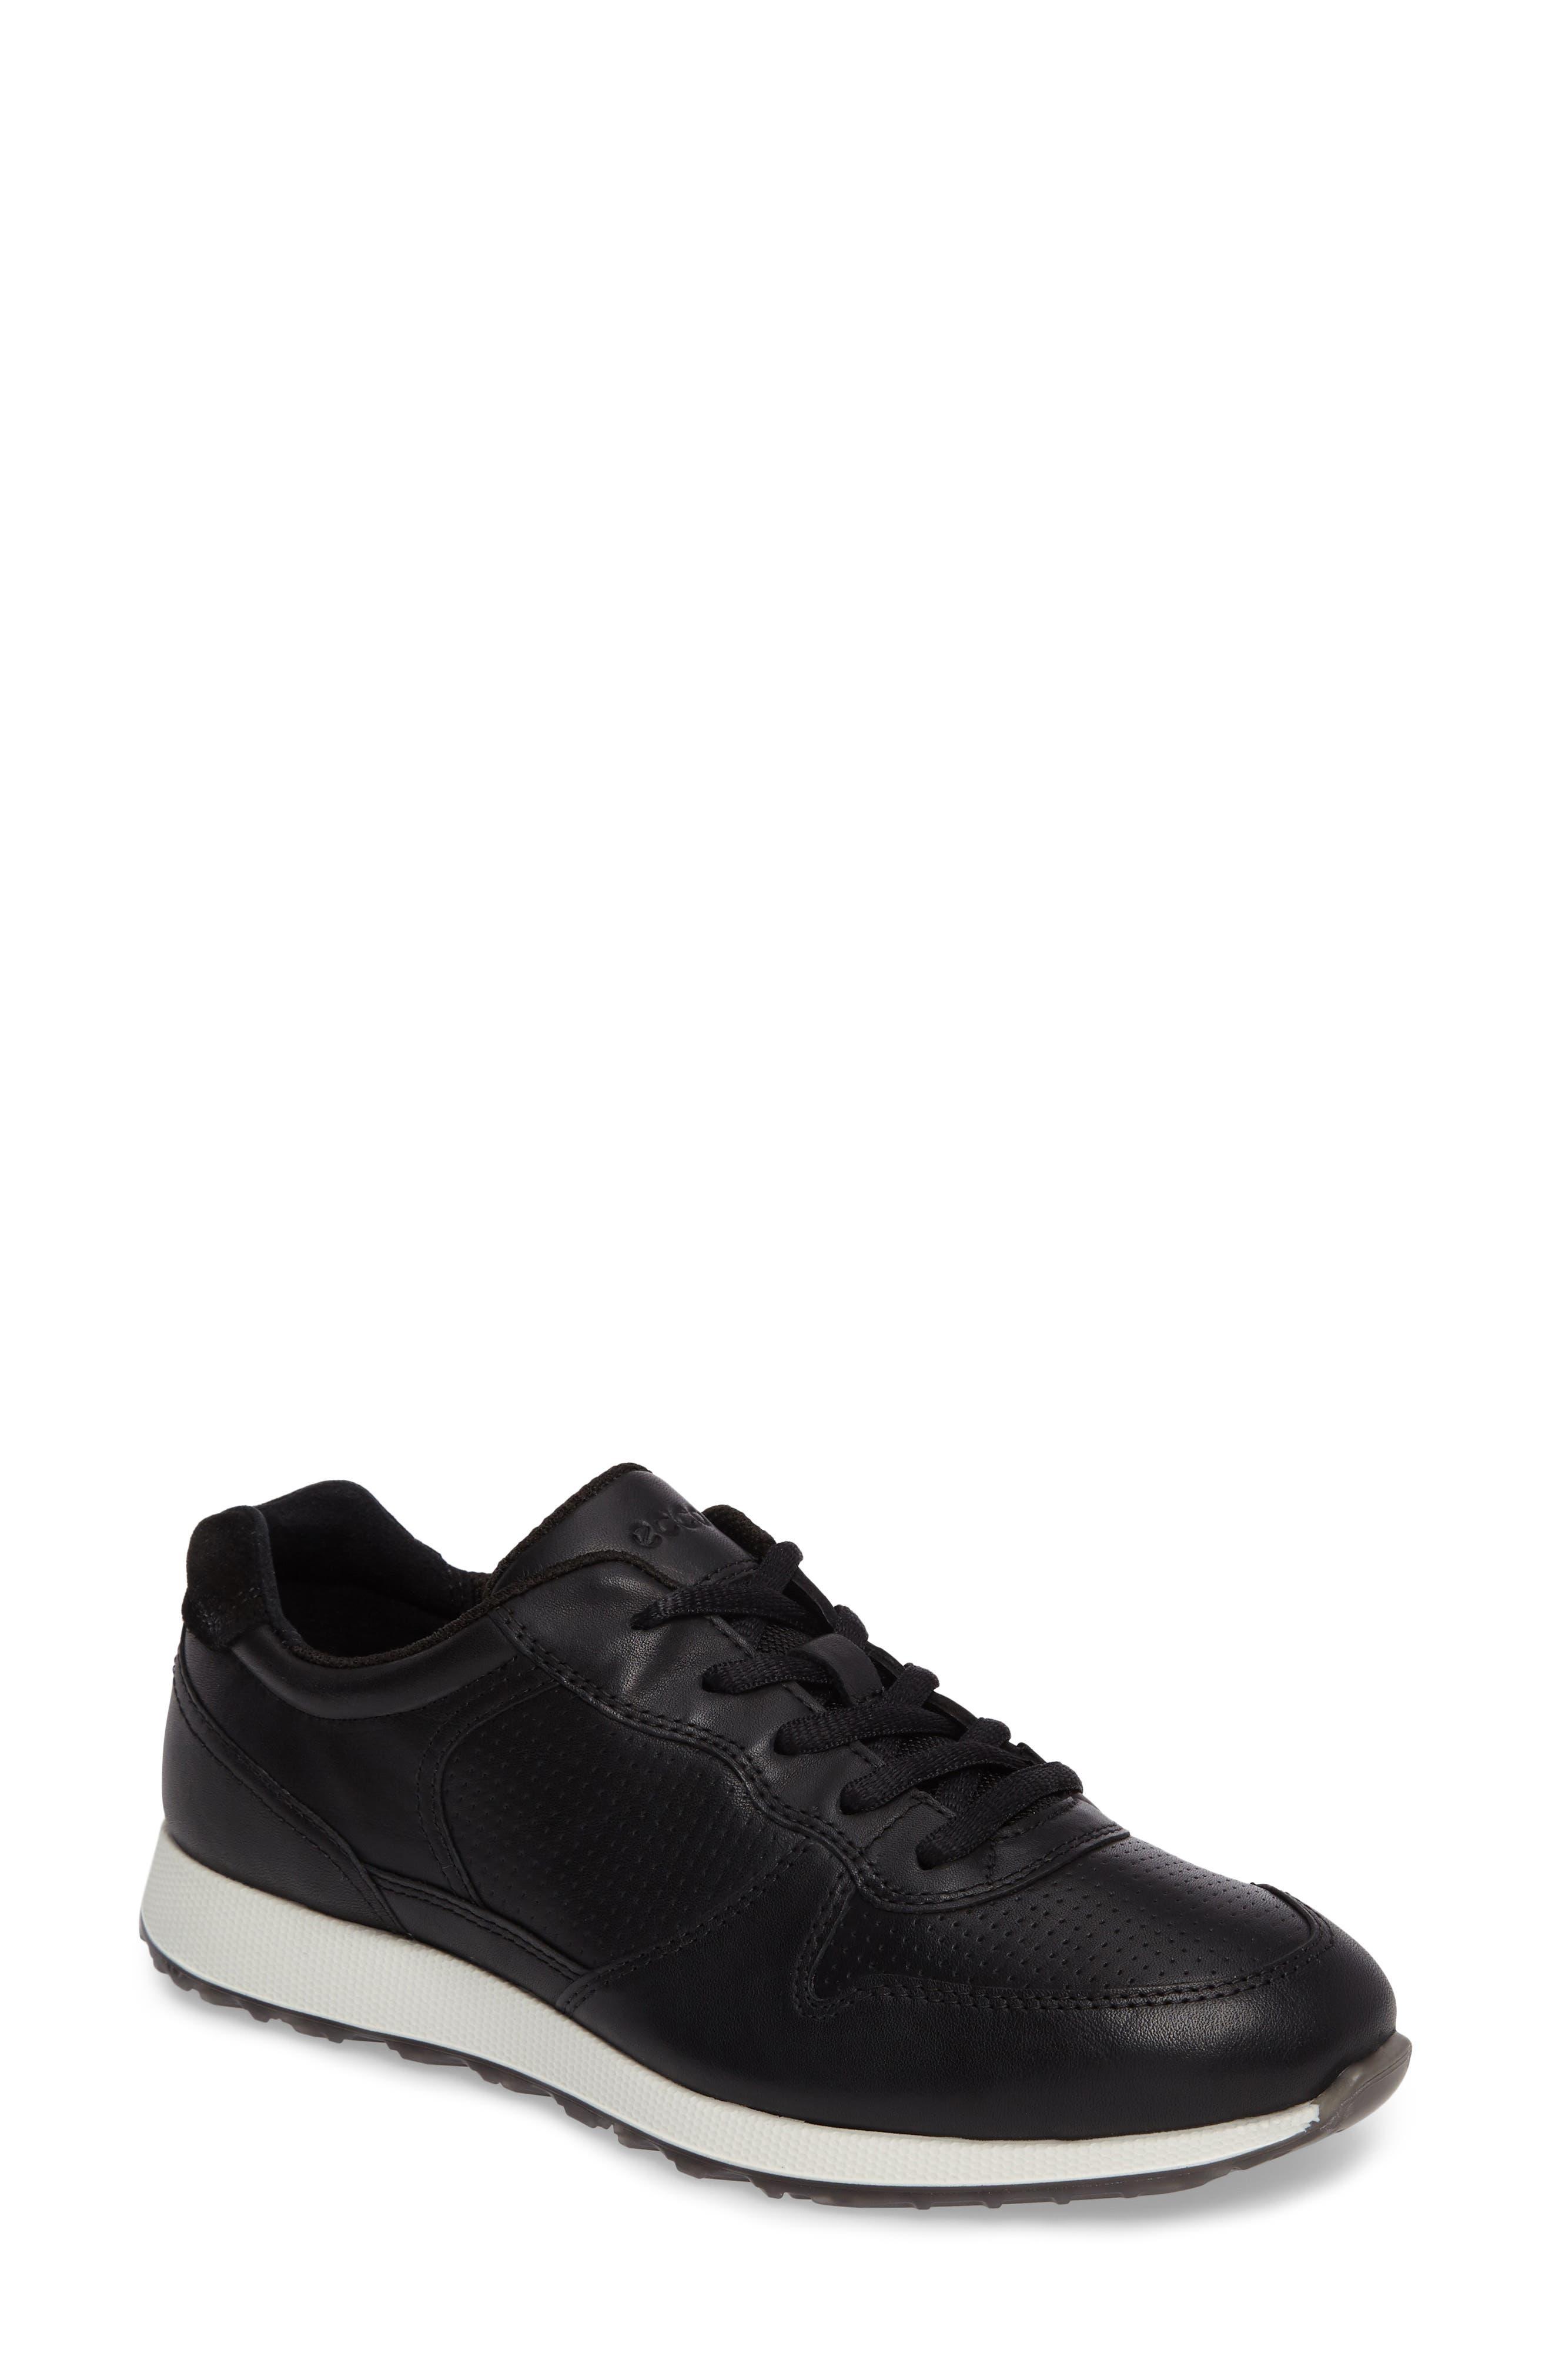 Performance Sneaker,                         Main,                         color, 001